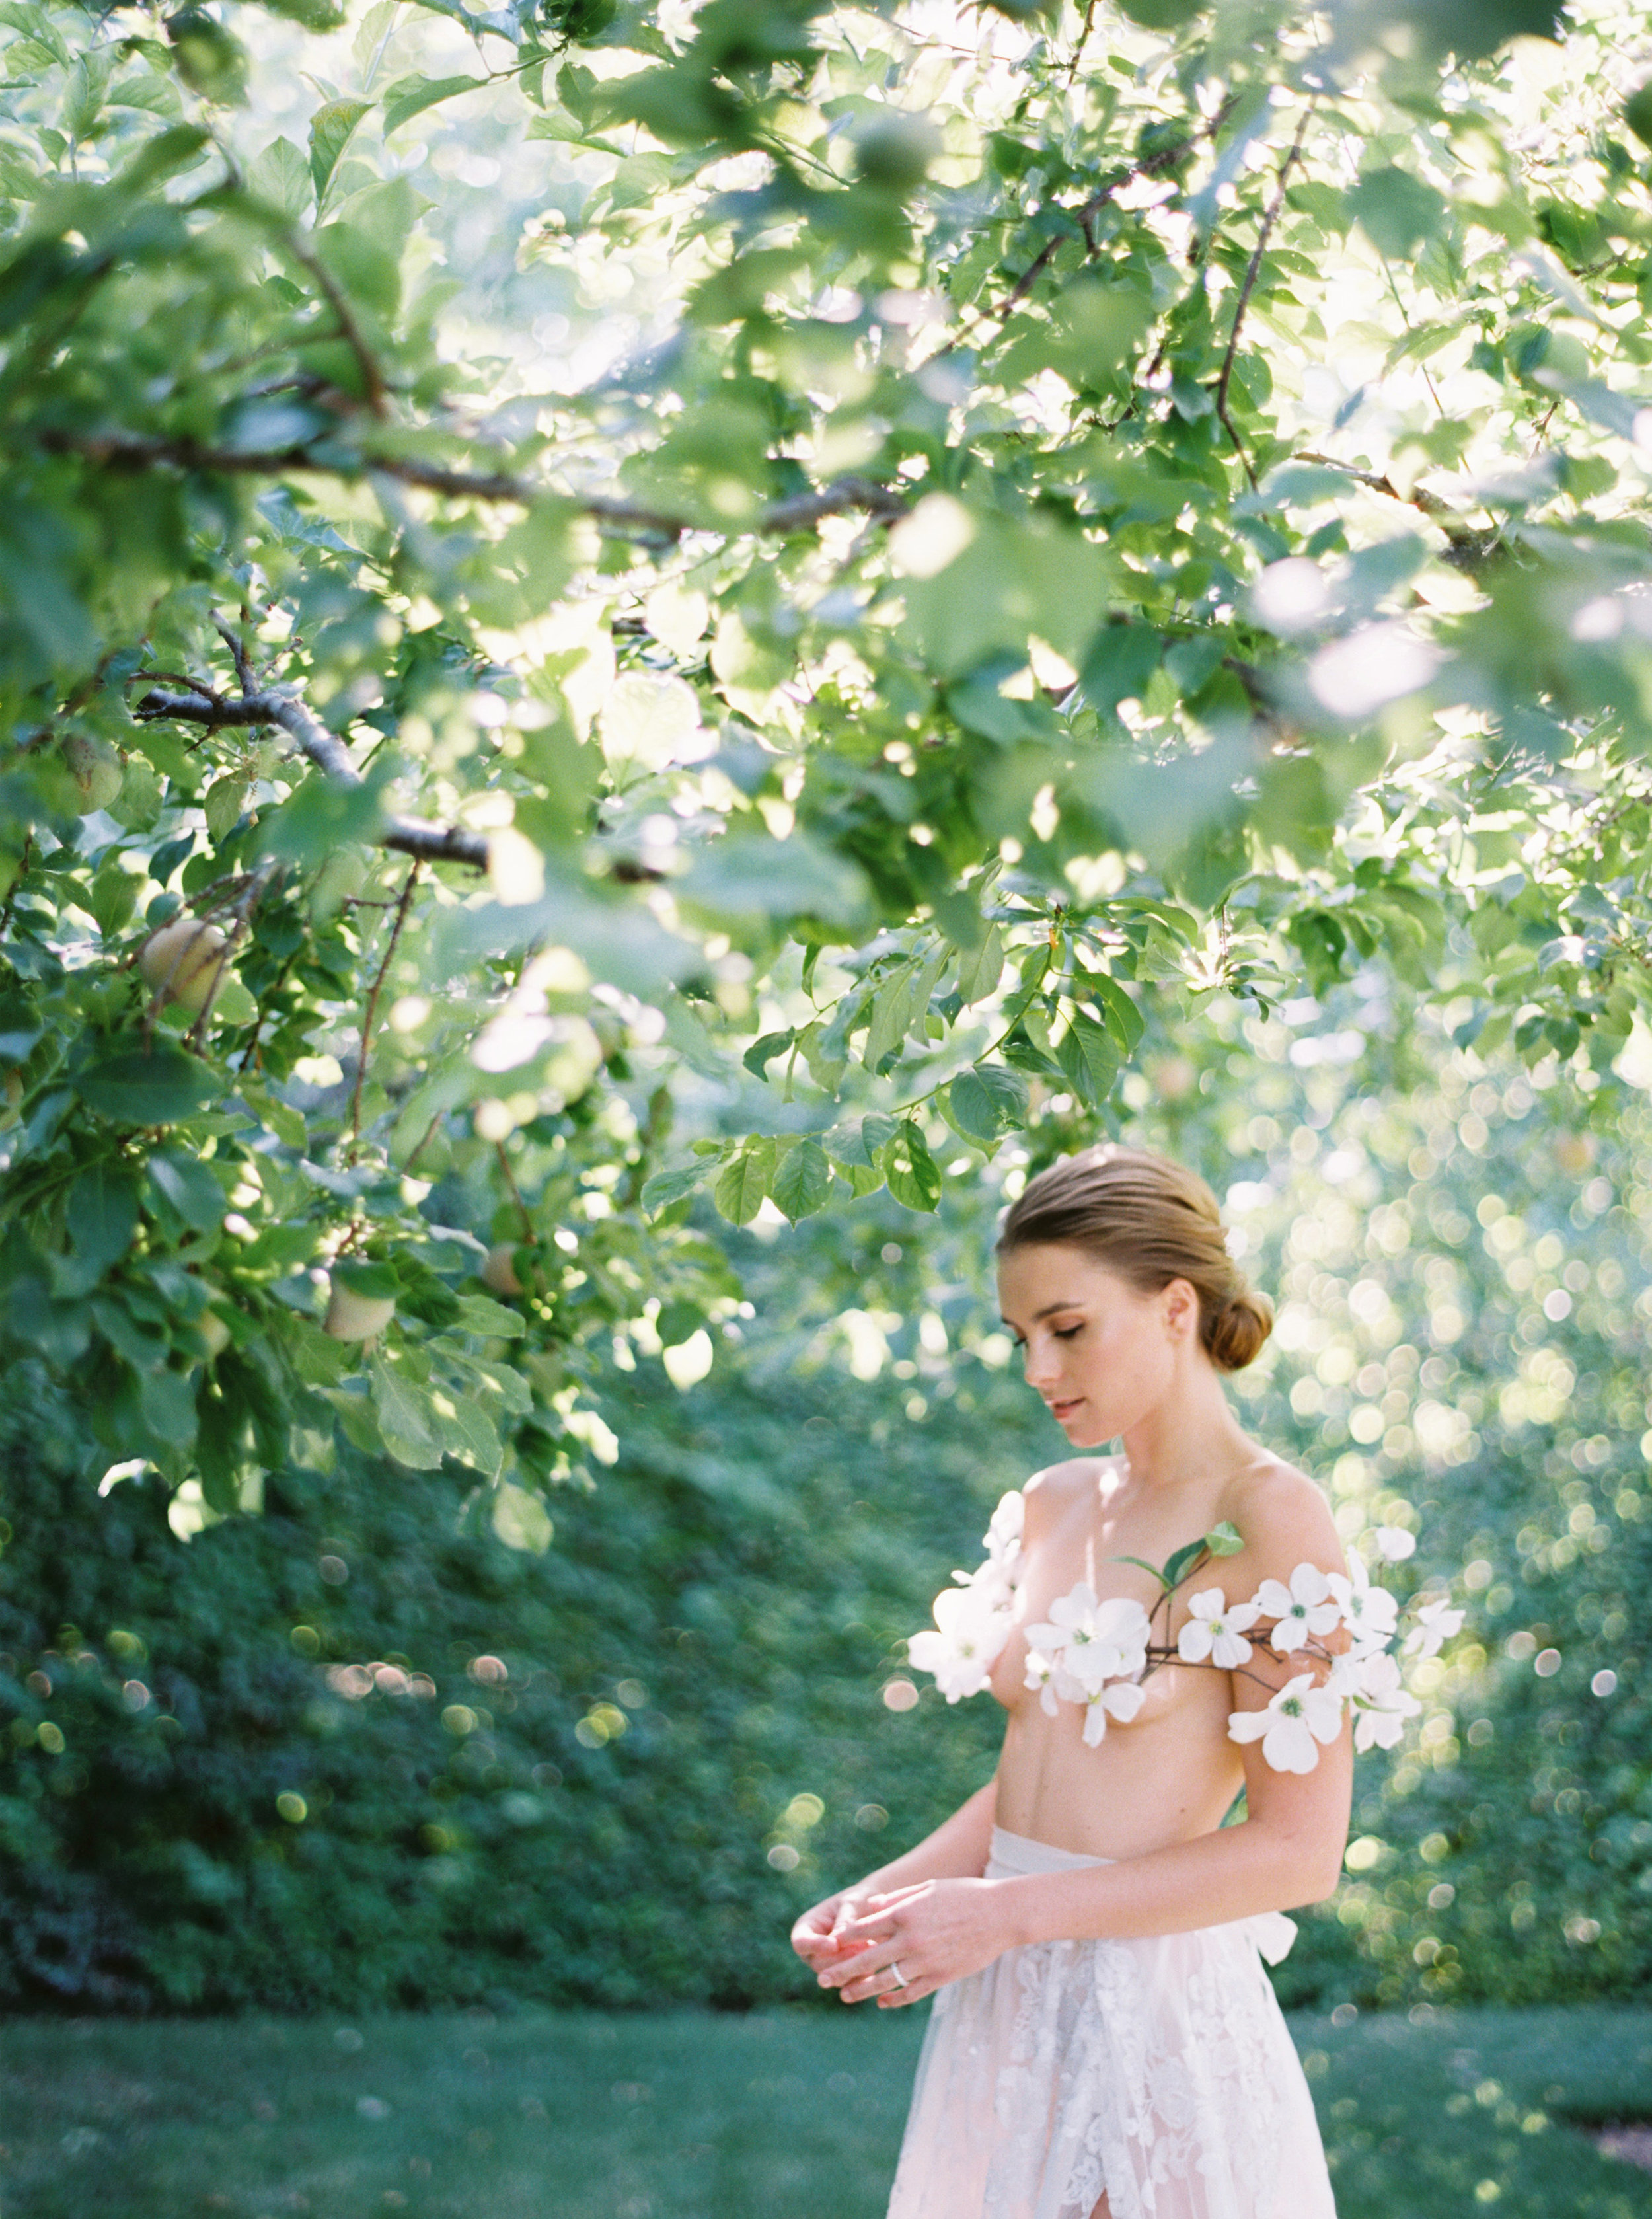 JennyQuicksallPhotography_www.jennyquicksall.com_KestlerPark_SantaYnezCalifornia_JoyProctor(27).jpg